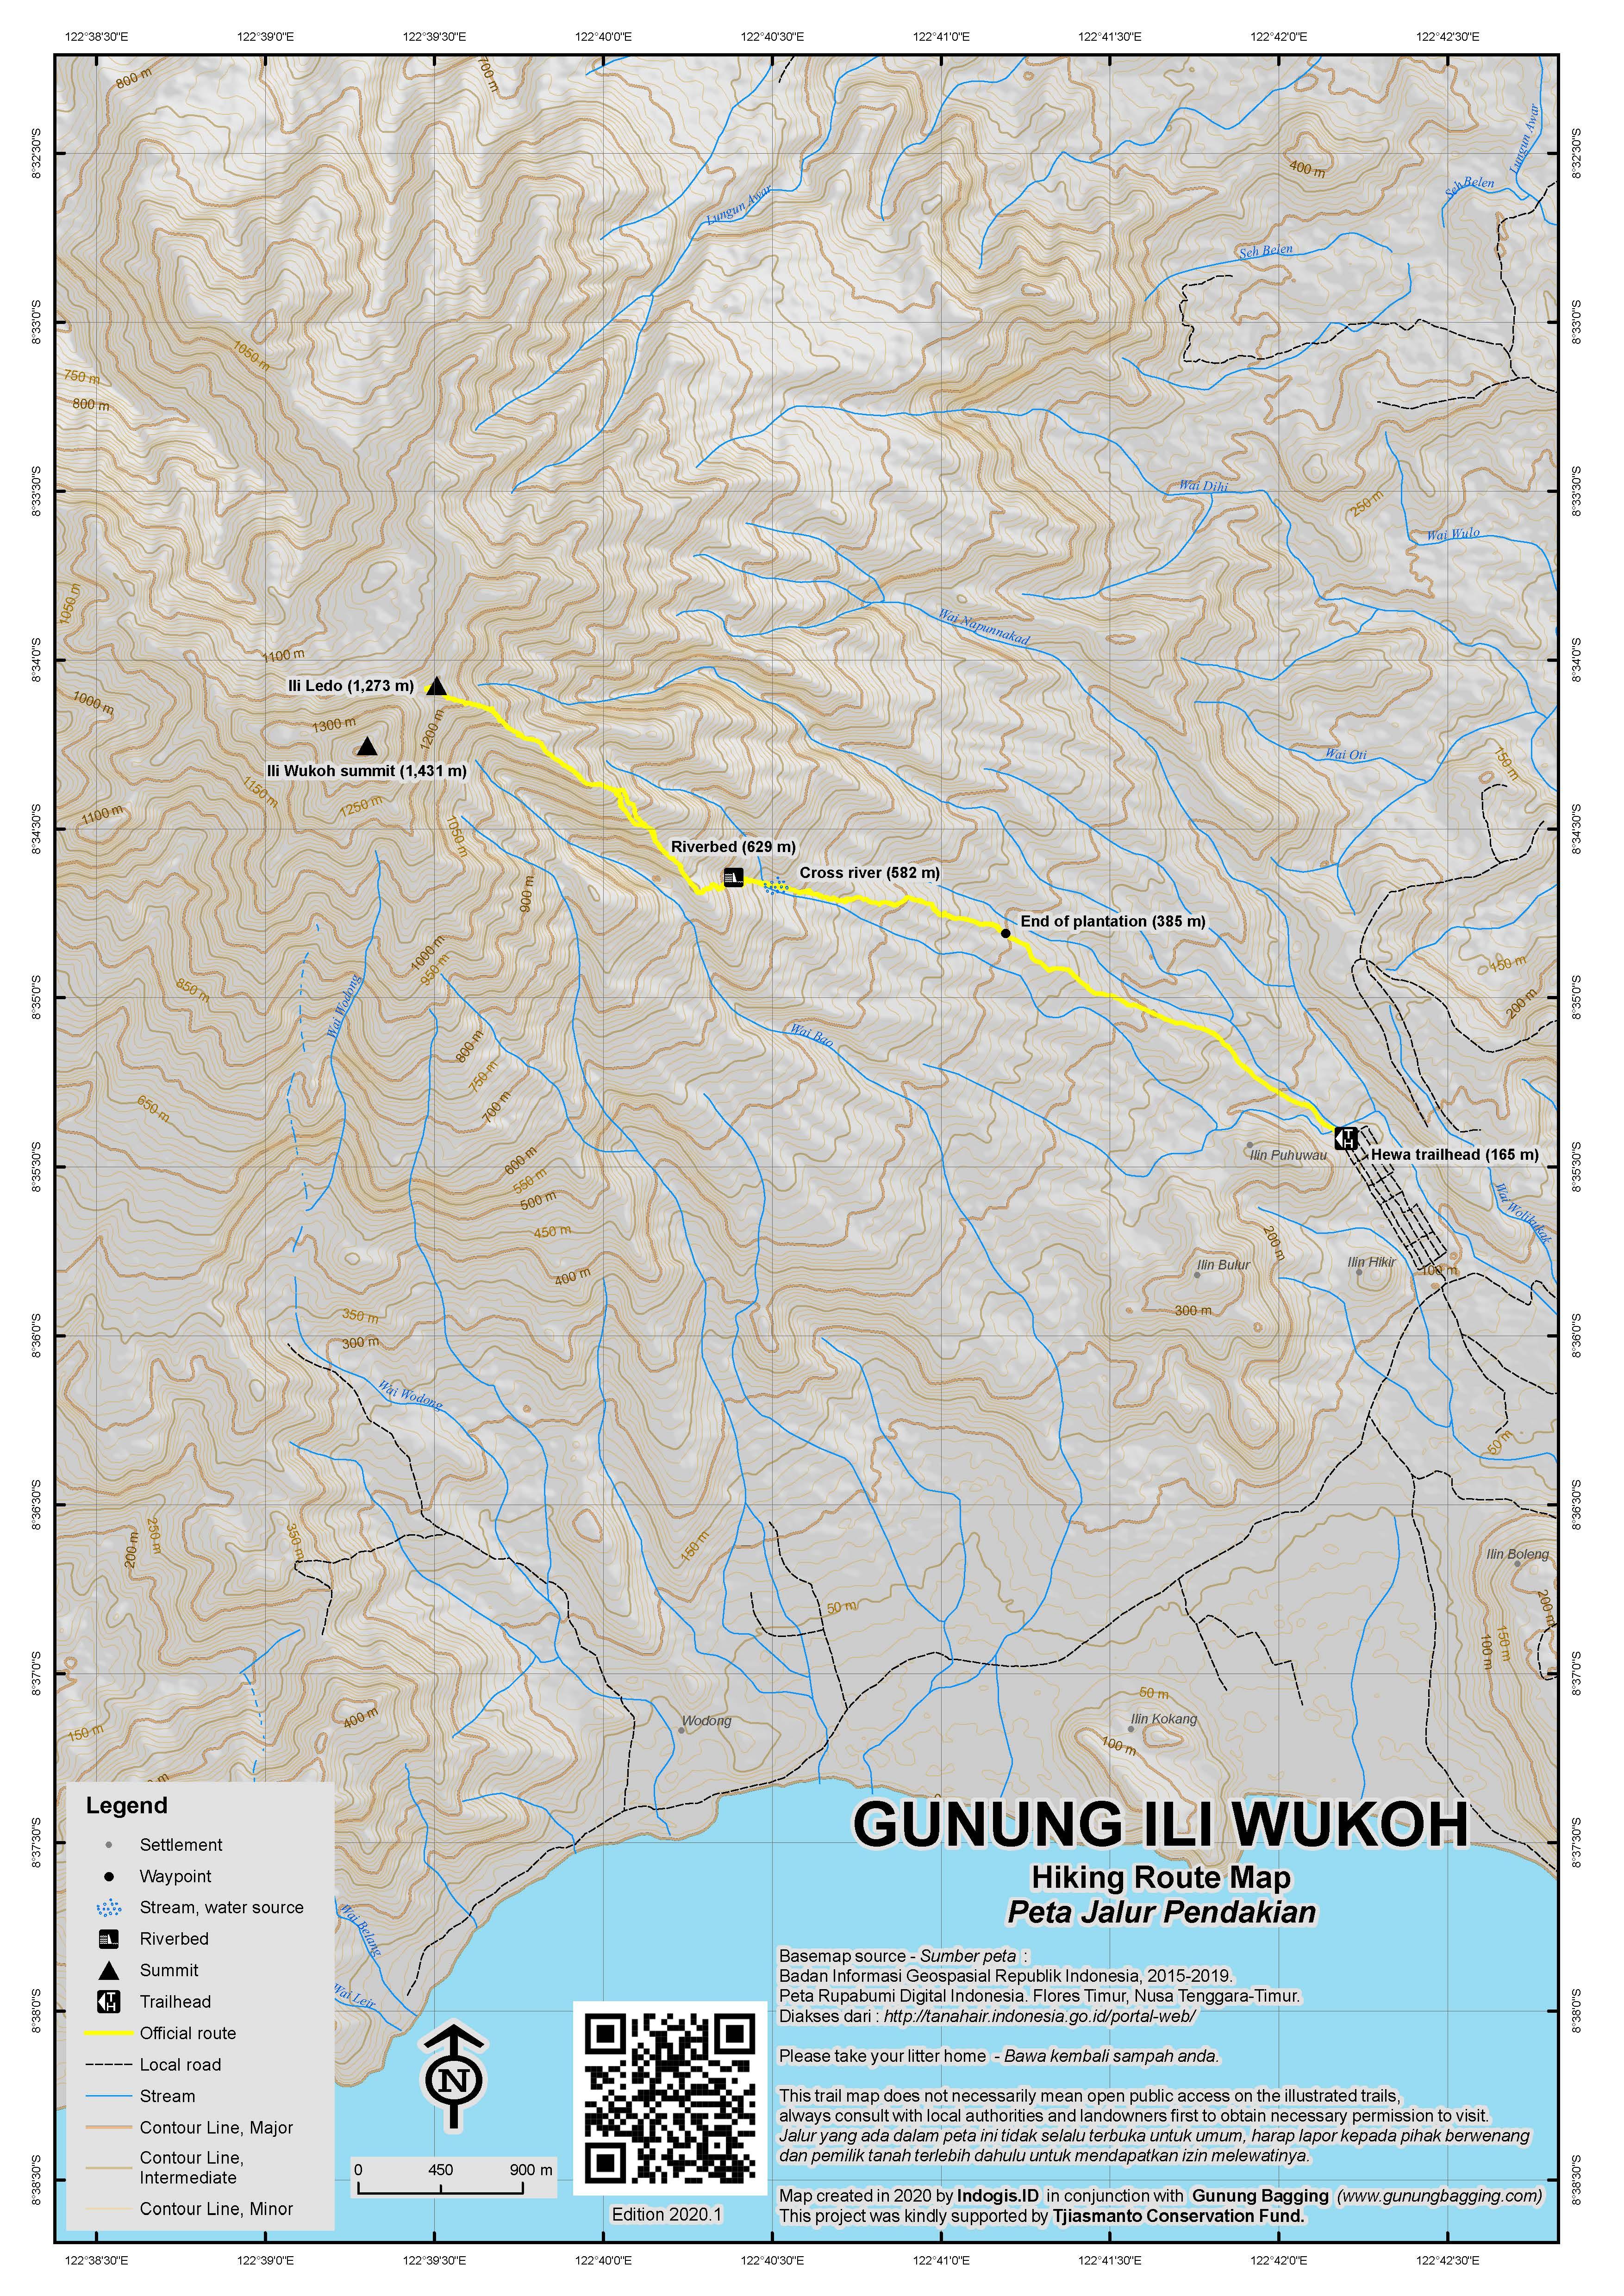 Peta Jalur Pendakian Ili Wukoh